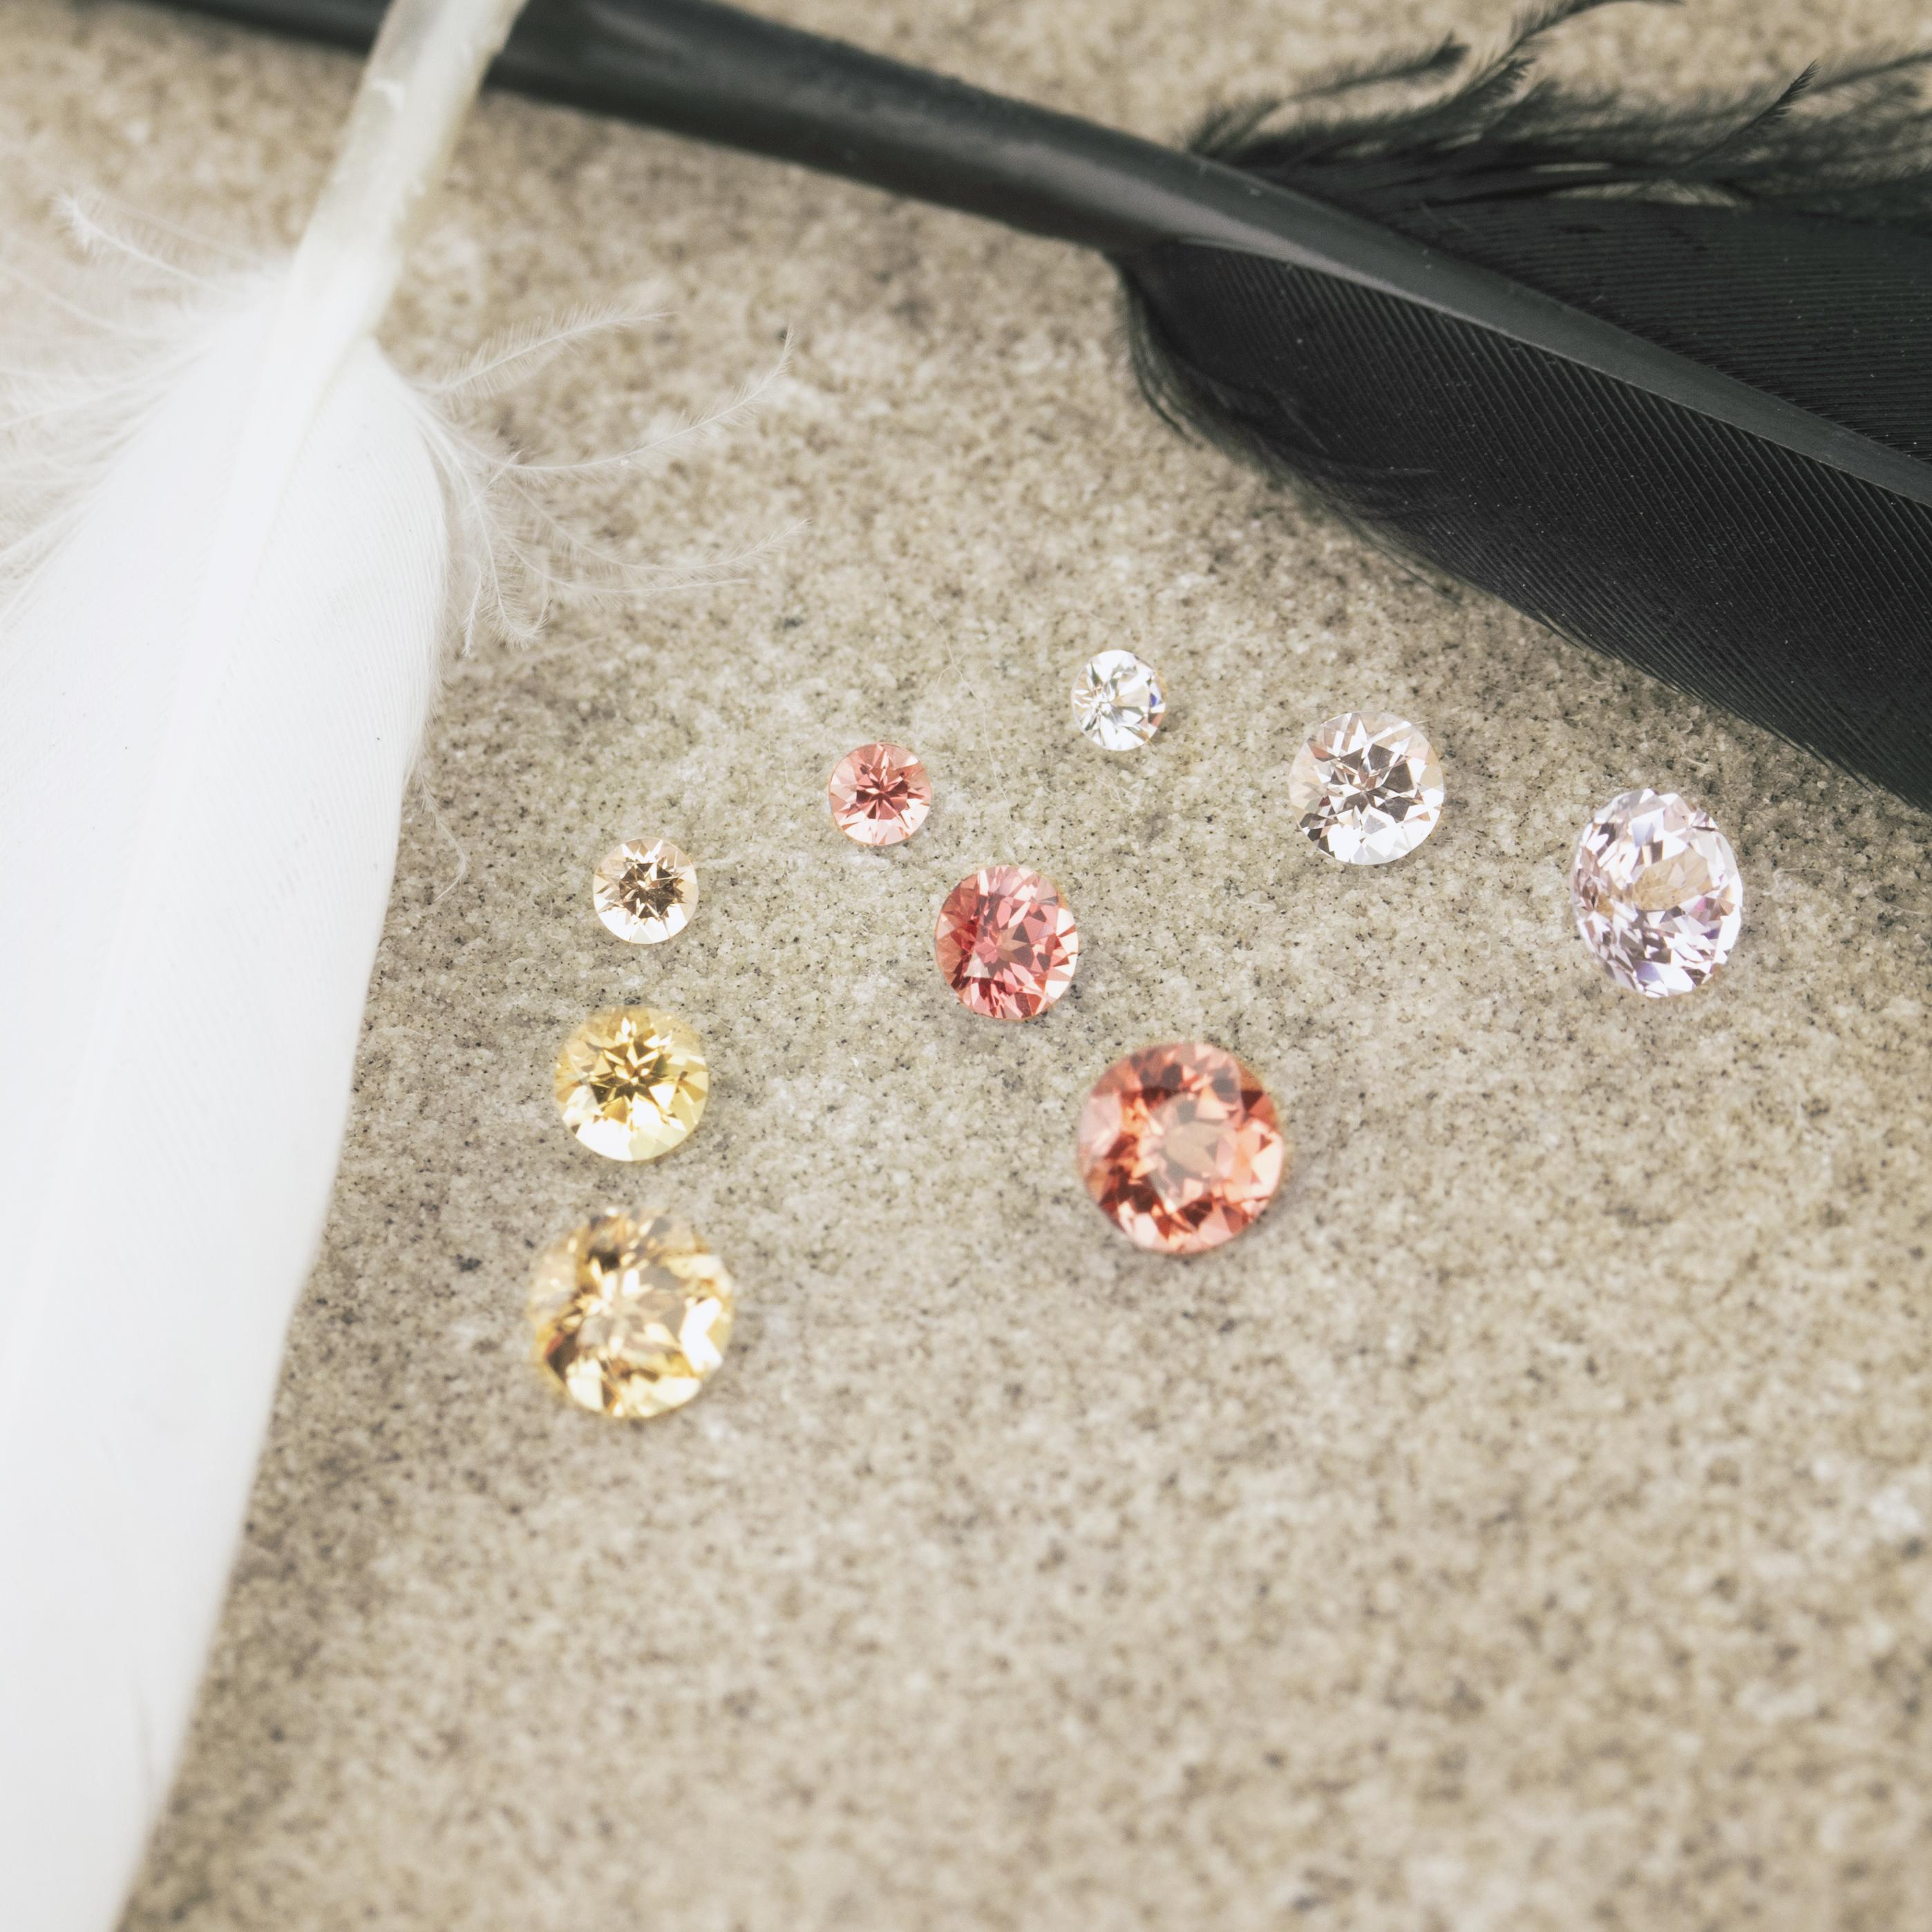 Laboratory grown diamonds and colored stones